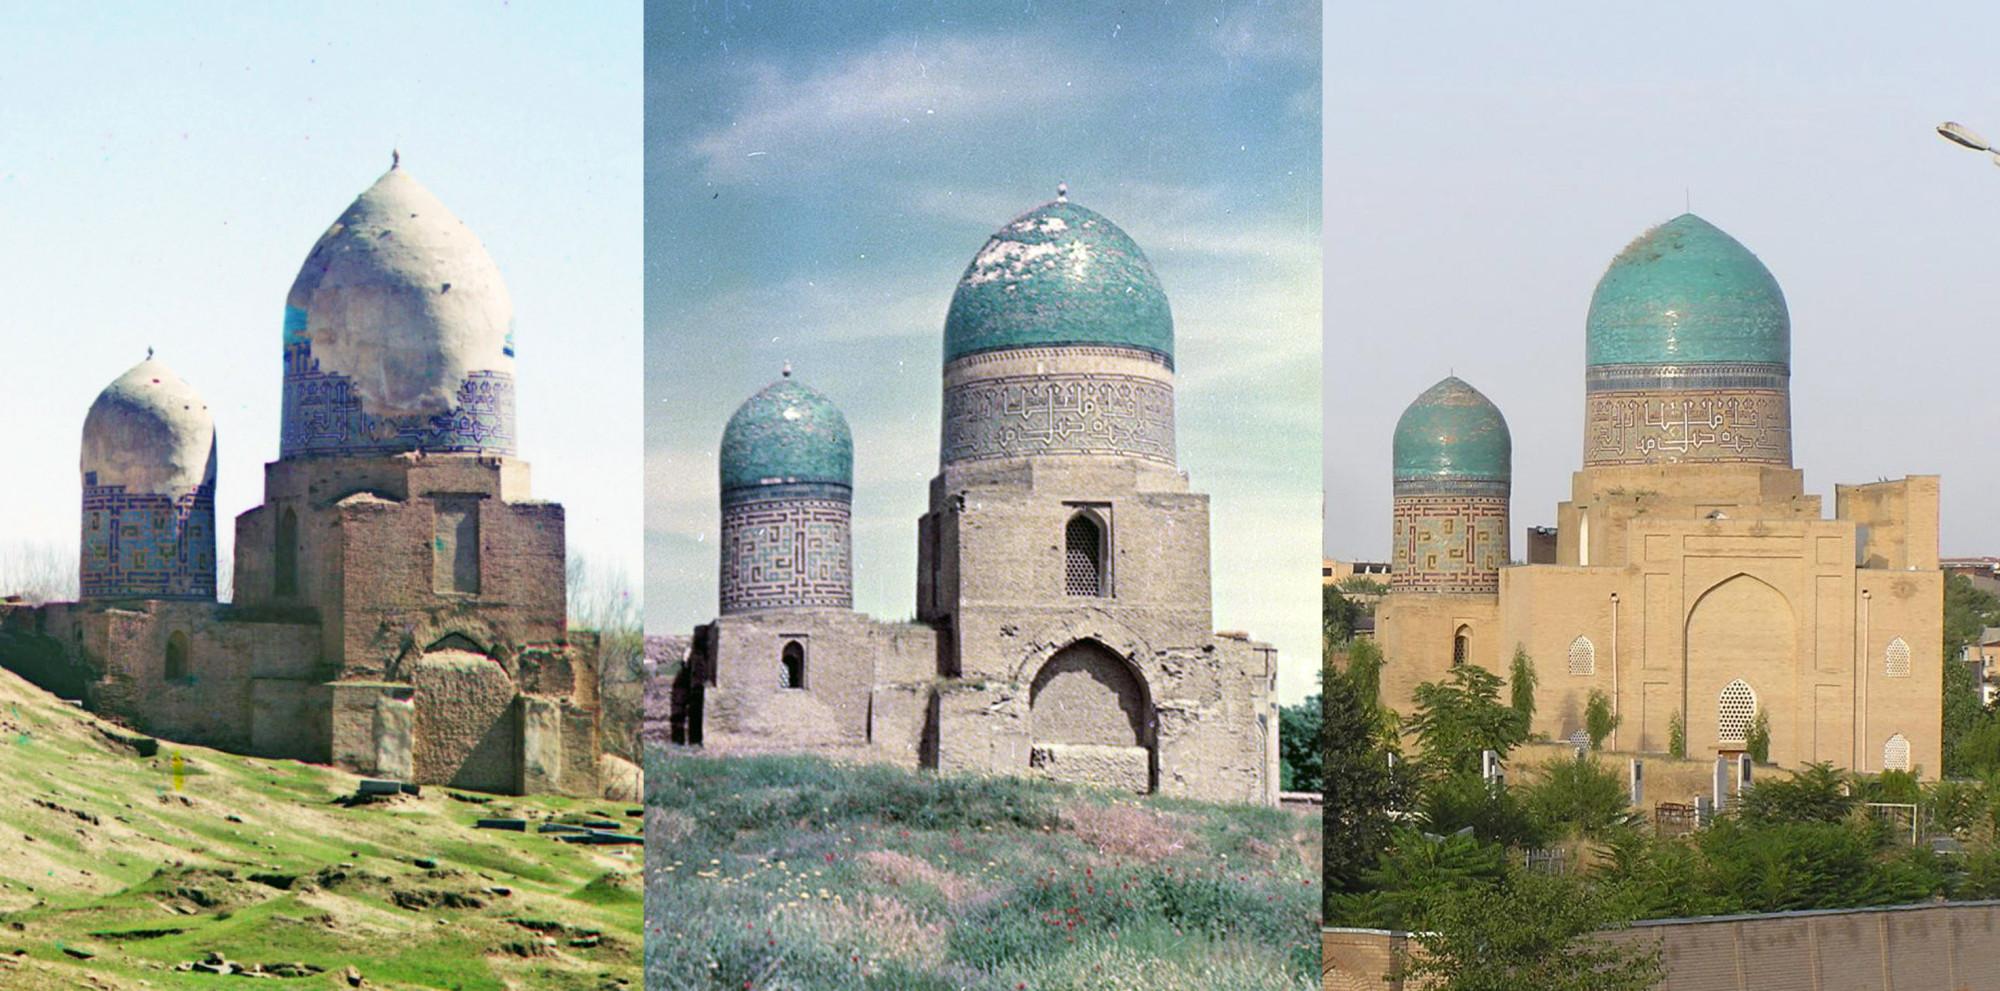 Нижняя группа мавзолеев ансамбля Шахи Зинда. 1911-1965-2009